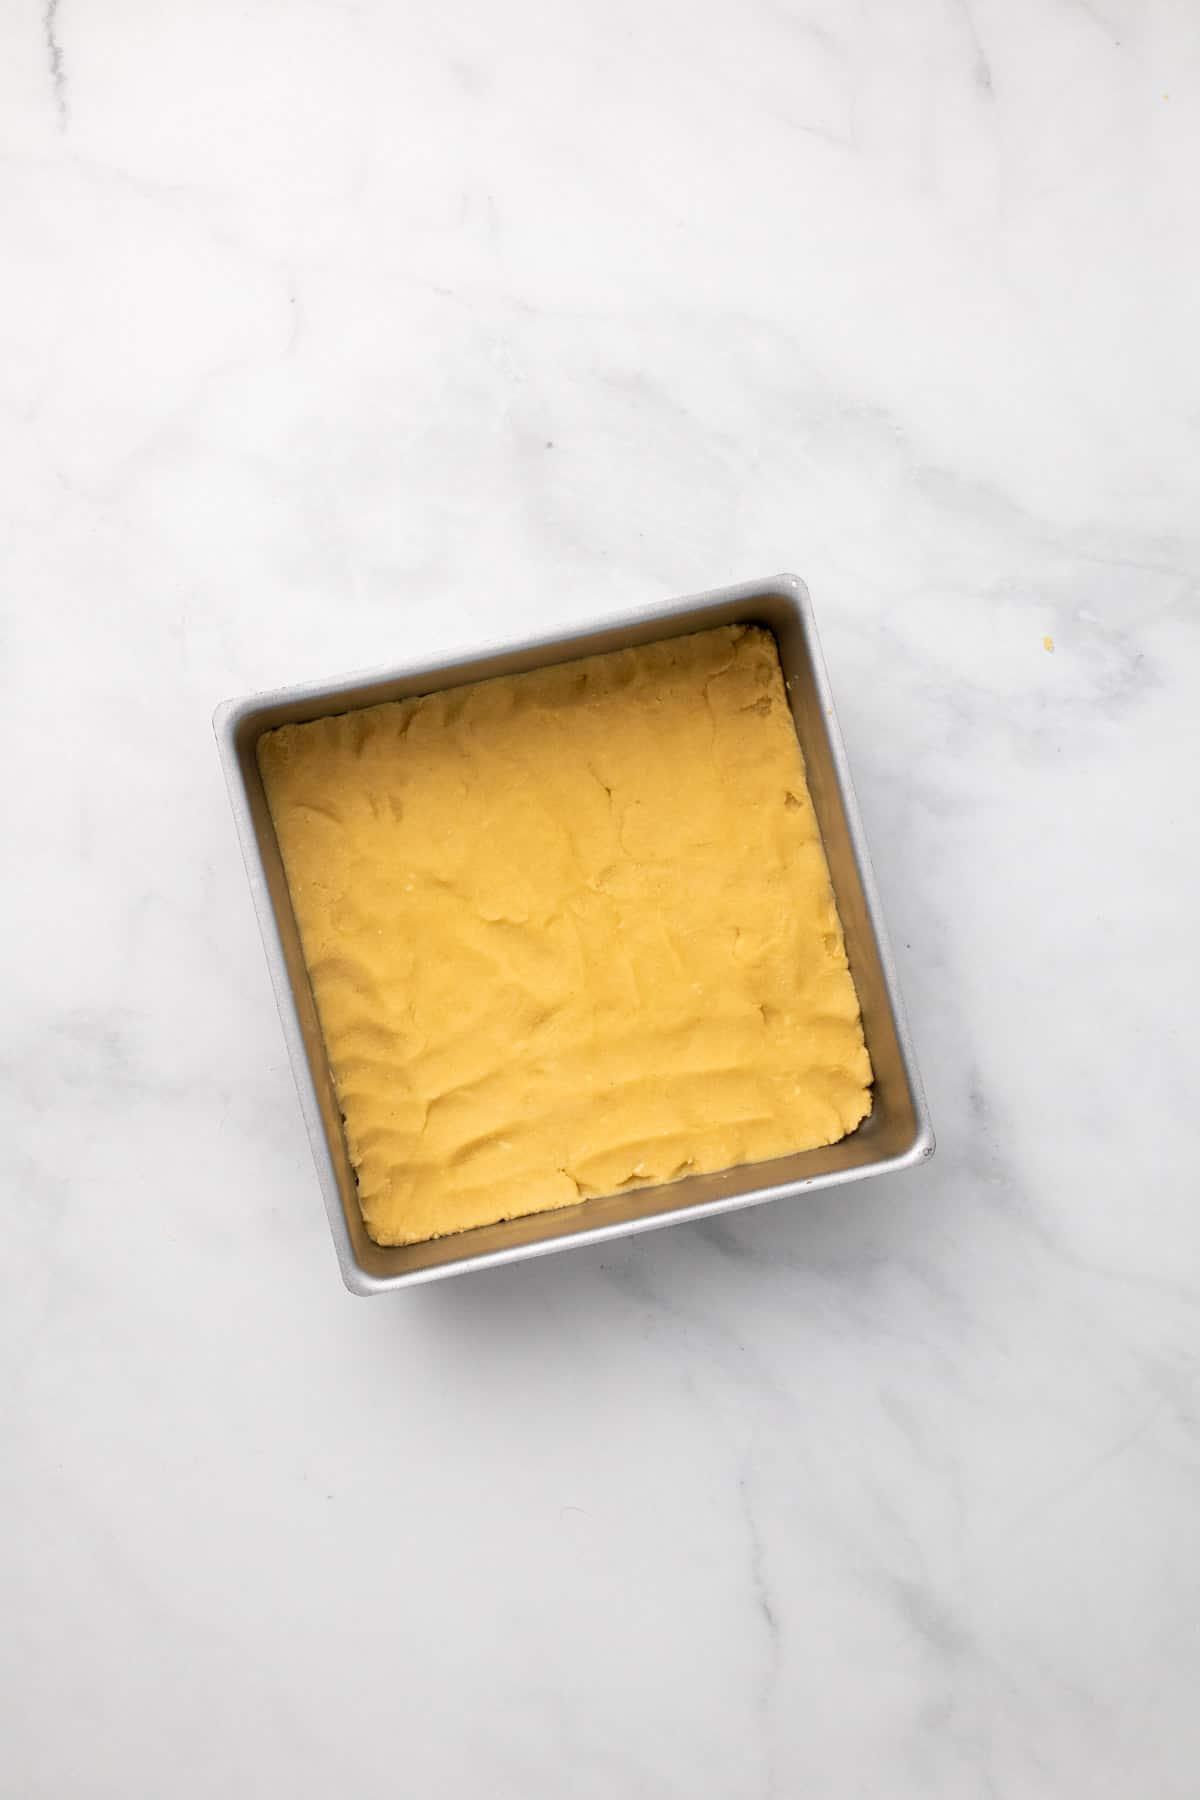 Dough pressed into a square pan